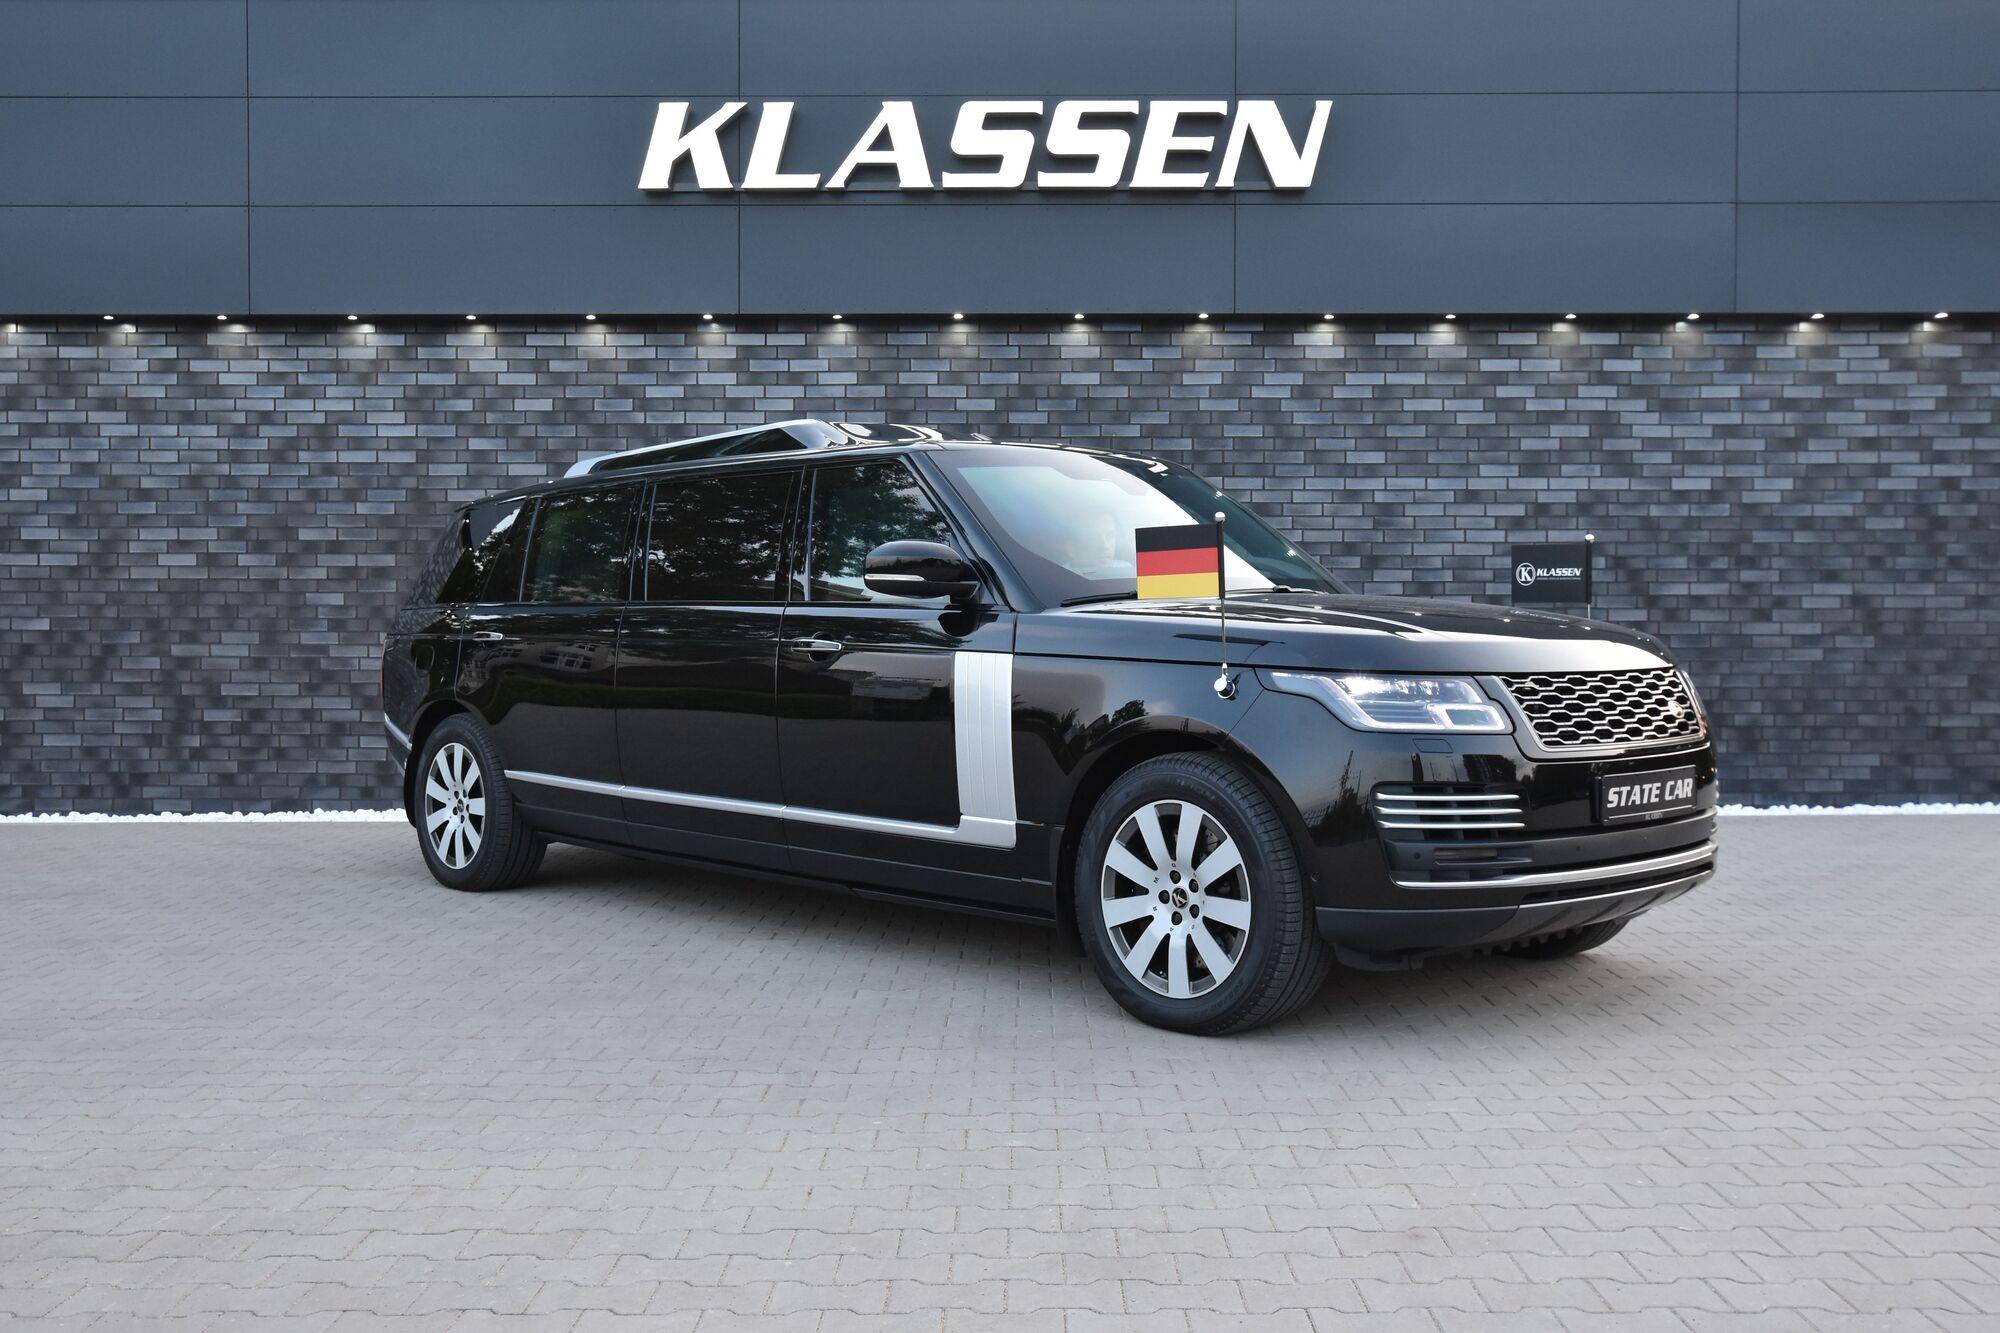 Range Rover Limusine Custa Mais De R 7 Milhoes Motor Show